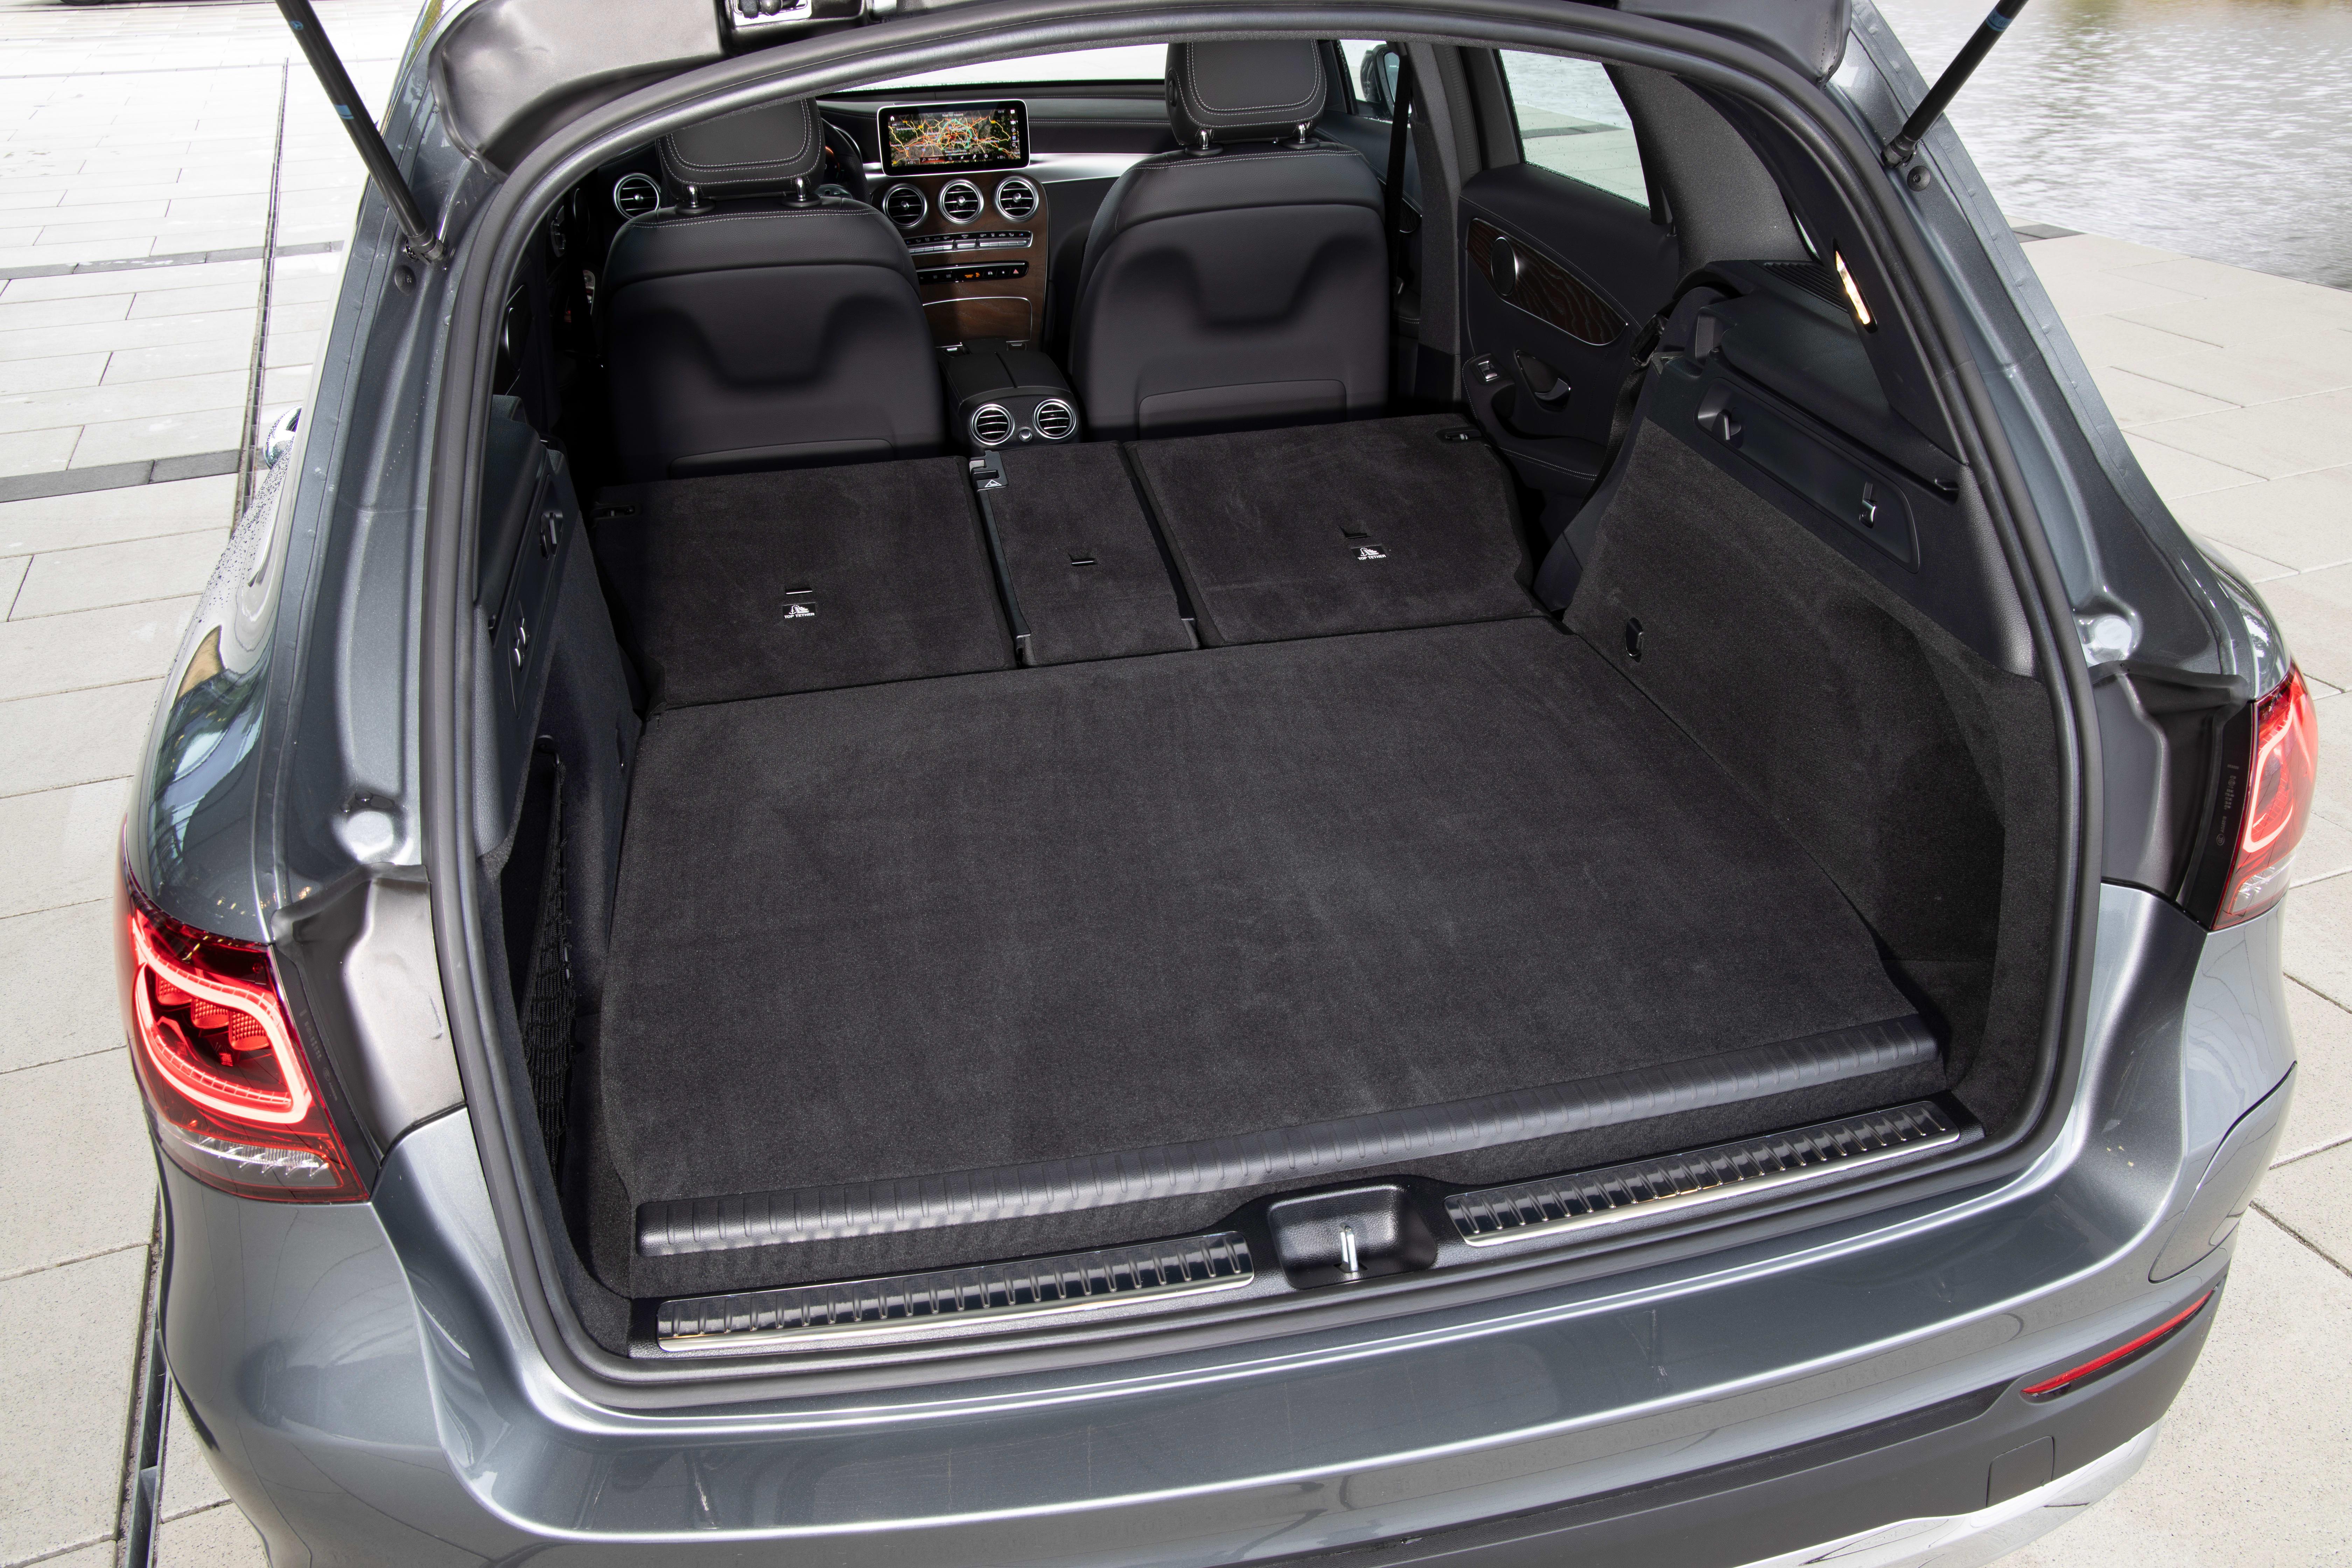 2020 Mercedes Benz Glc 300e Phev Review Quick Drive Caradvice